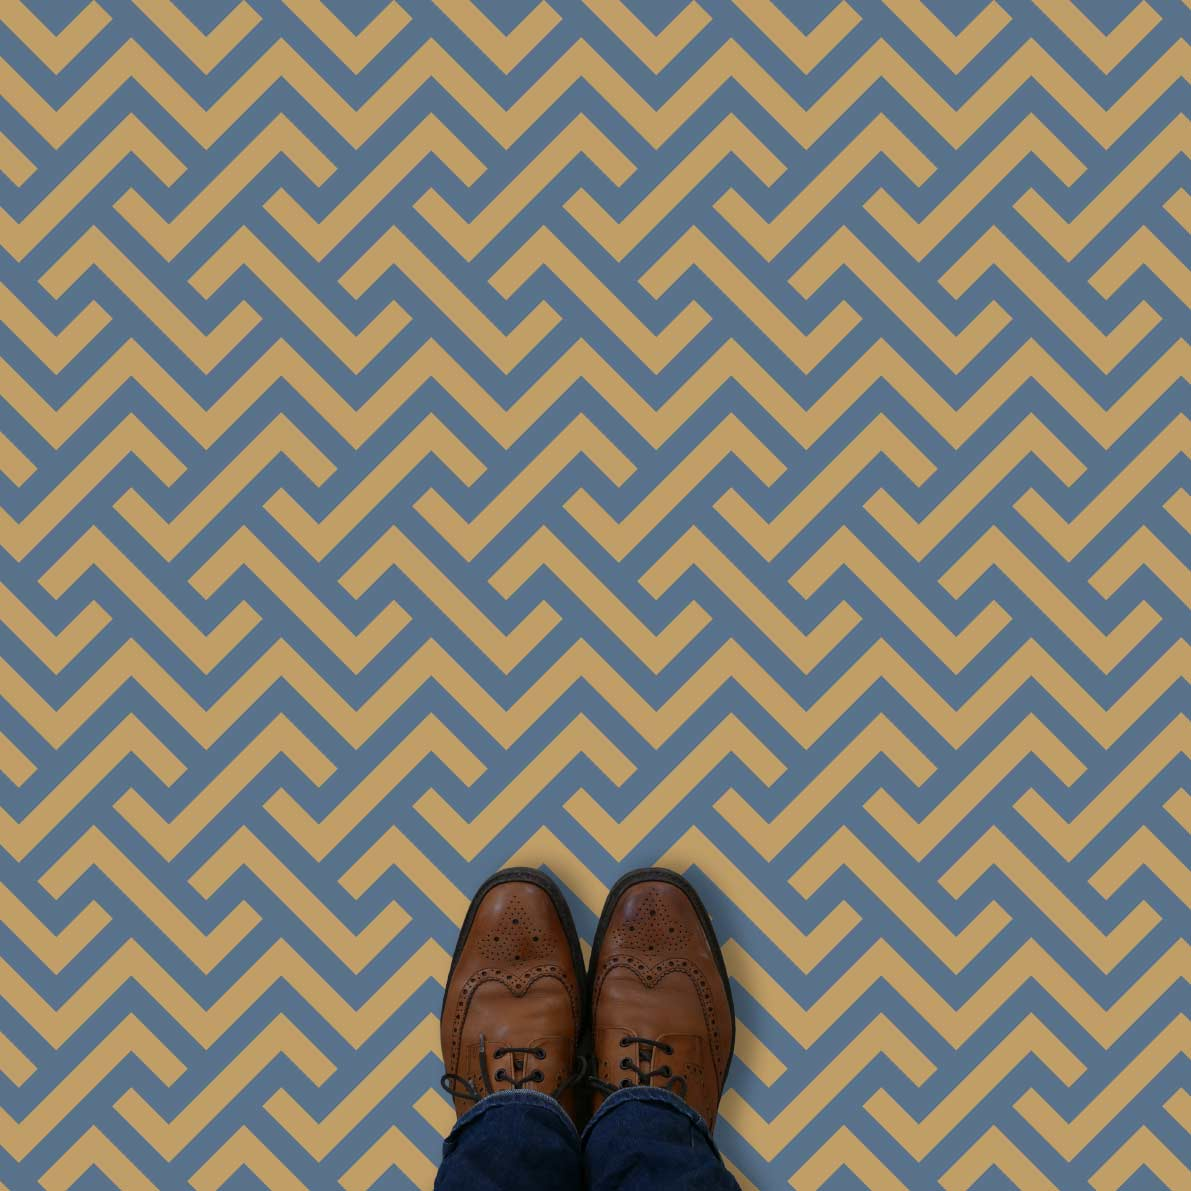 Vestra parquet style pattern printed geometric design vinyl flooring exclusively from forthefloorandmore.com